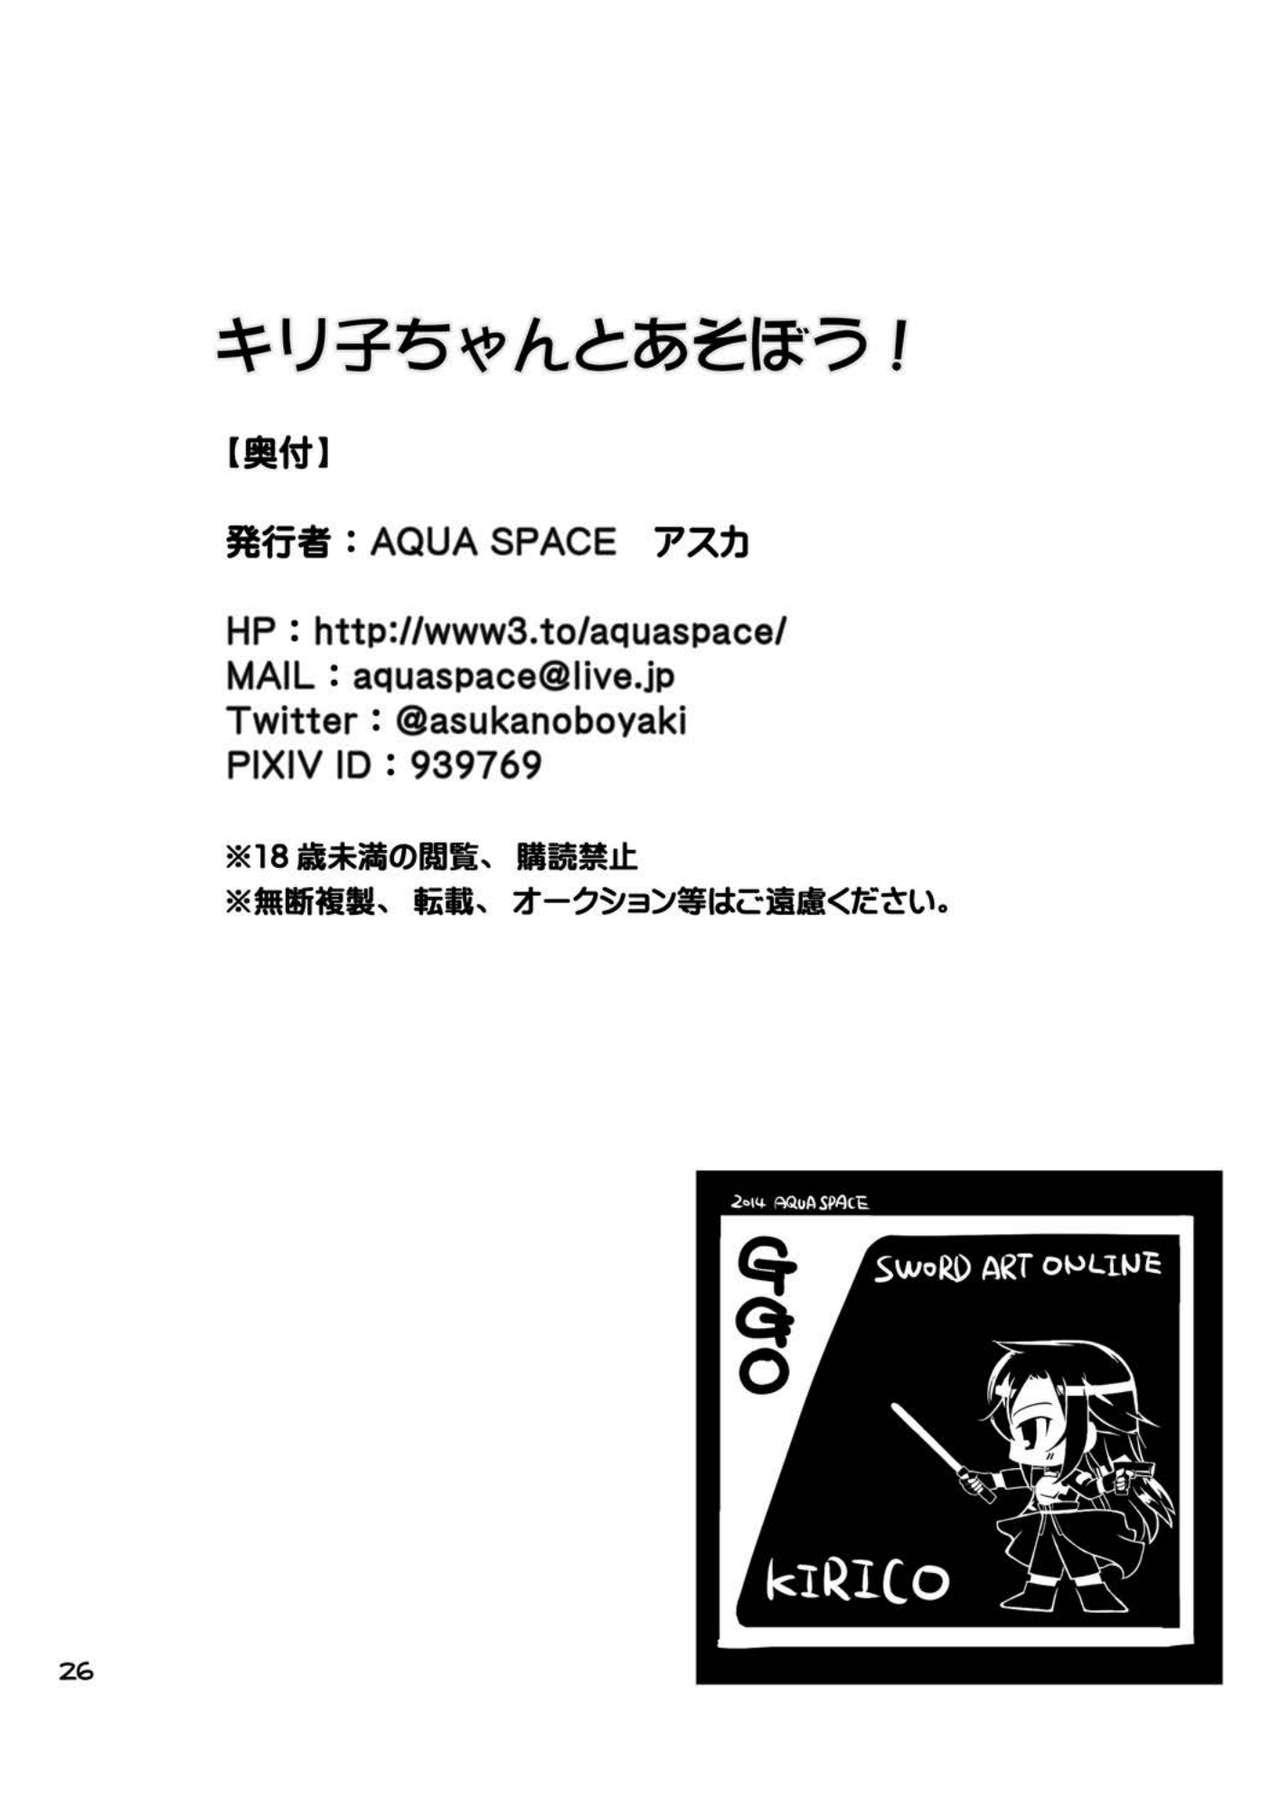 [AQUA SPACE (Asuka)] Kiriko-chan to Asobou! | Let's play with Kiriko-chan! (Sword Art Online) [English] [EHCOVE] [Digital] 25